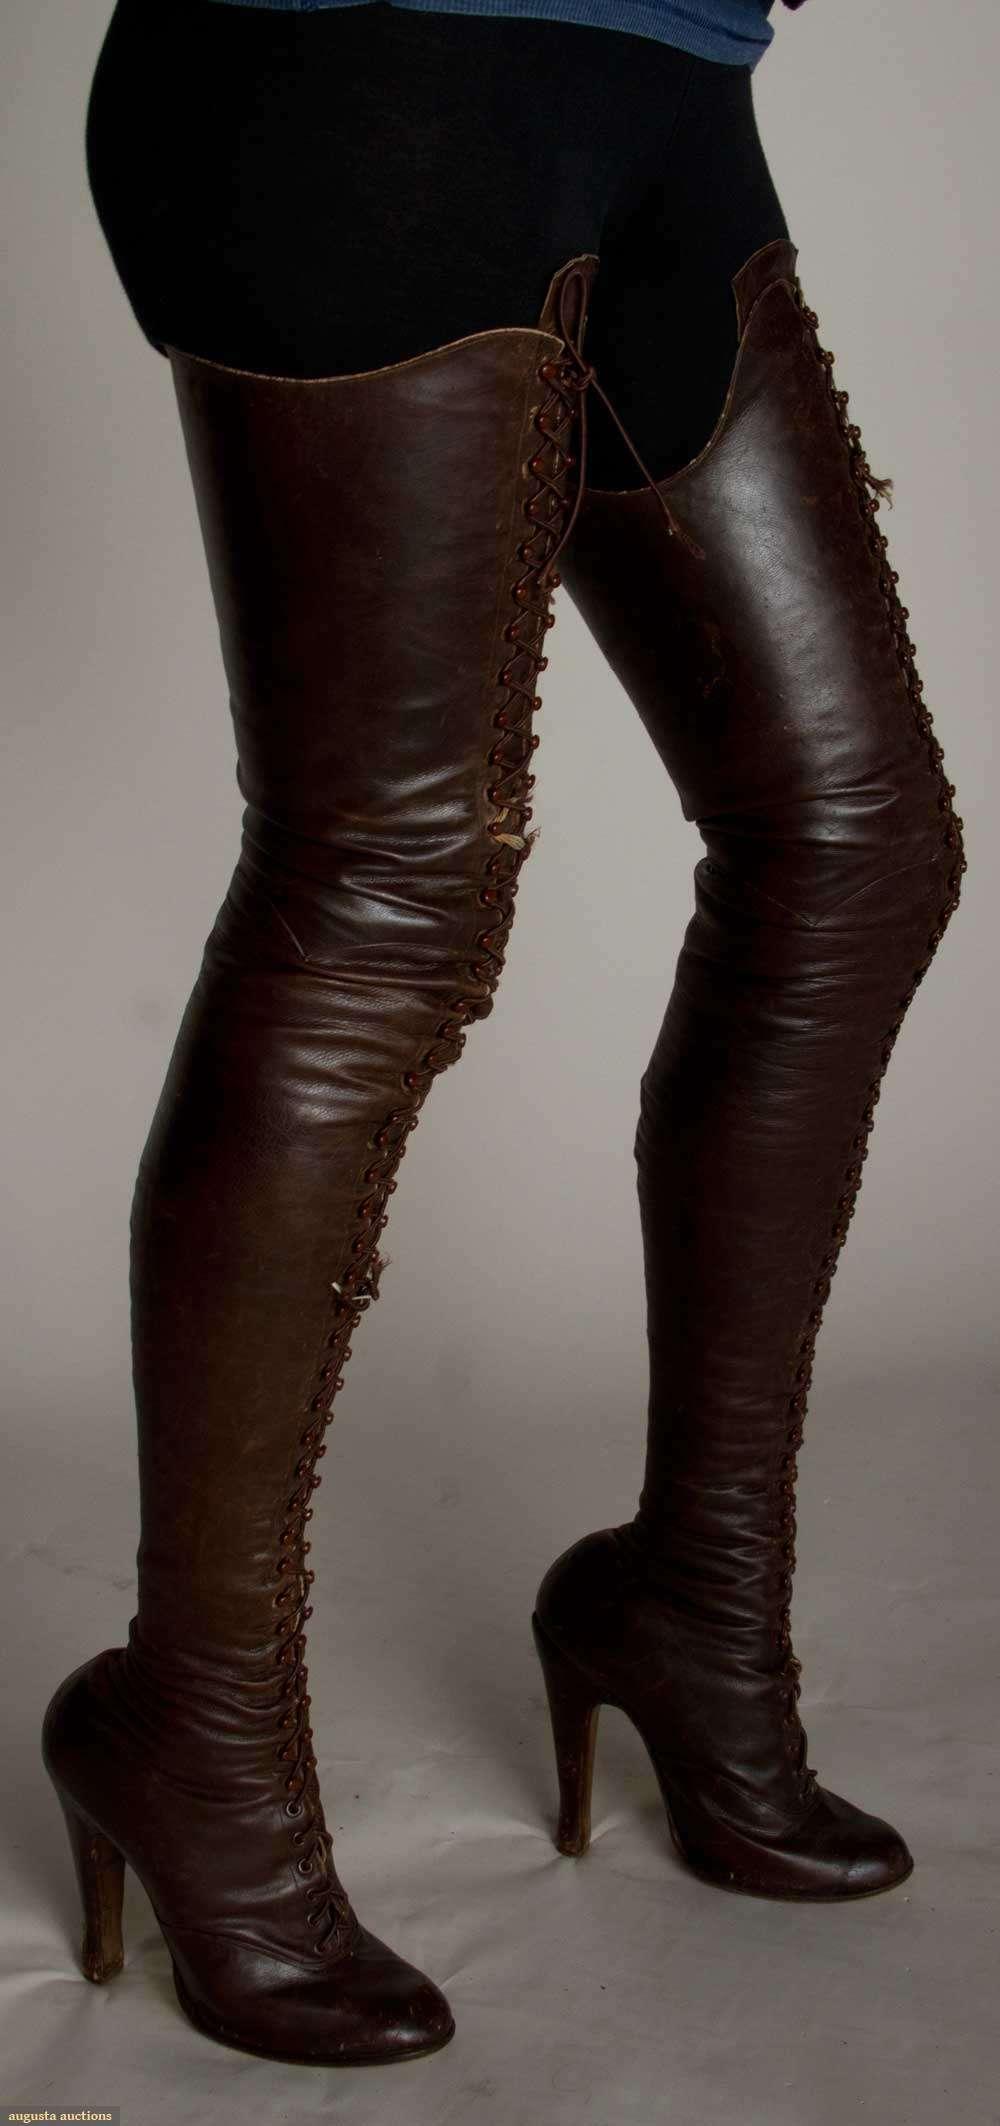 Boot fetish thigh